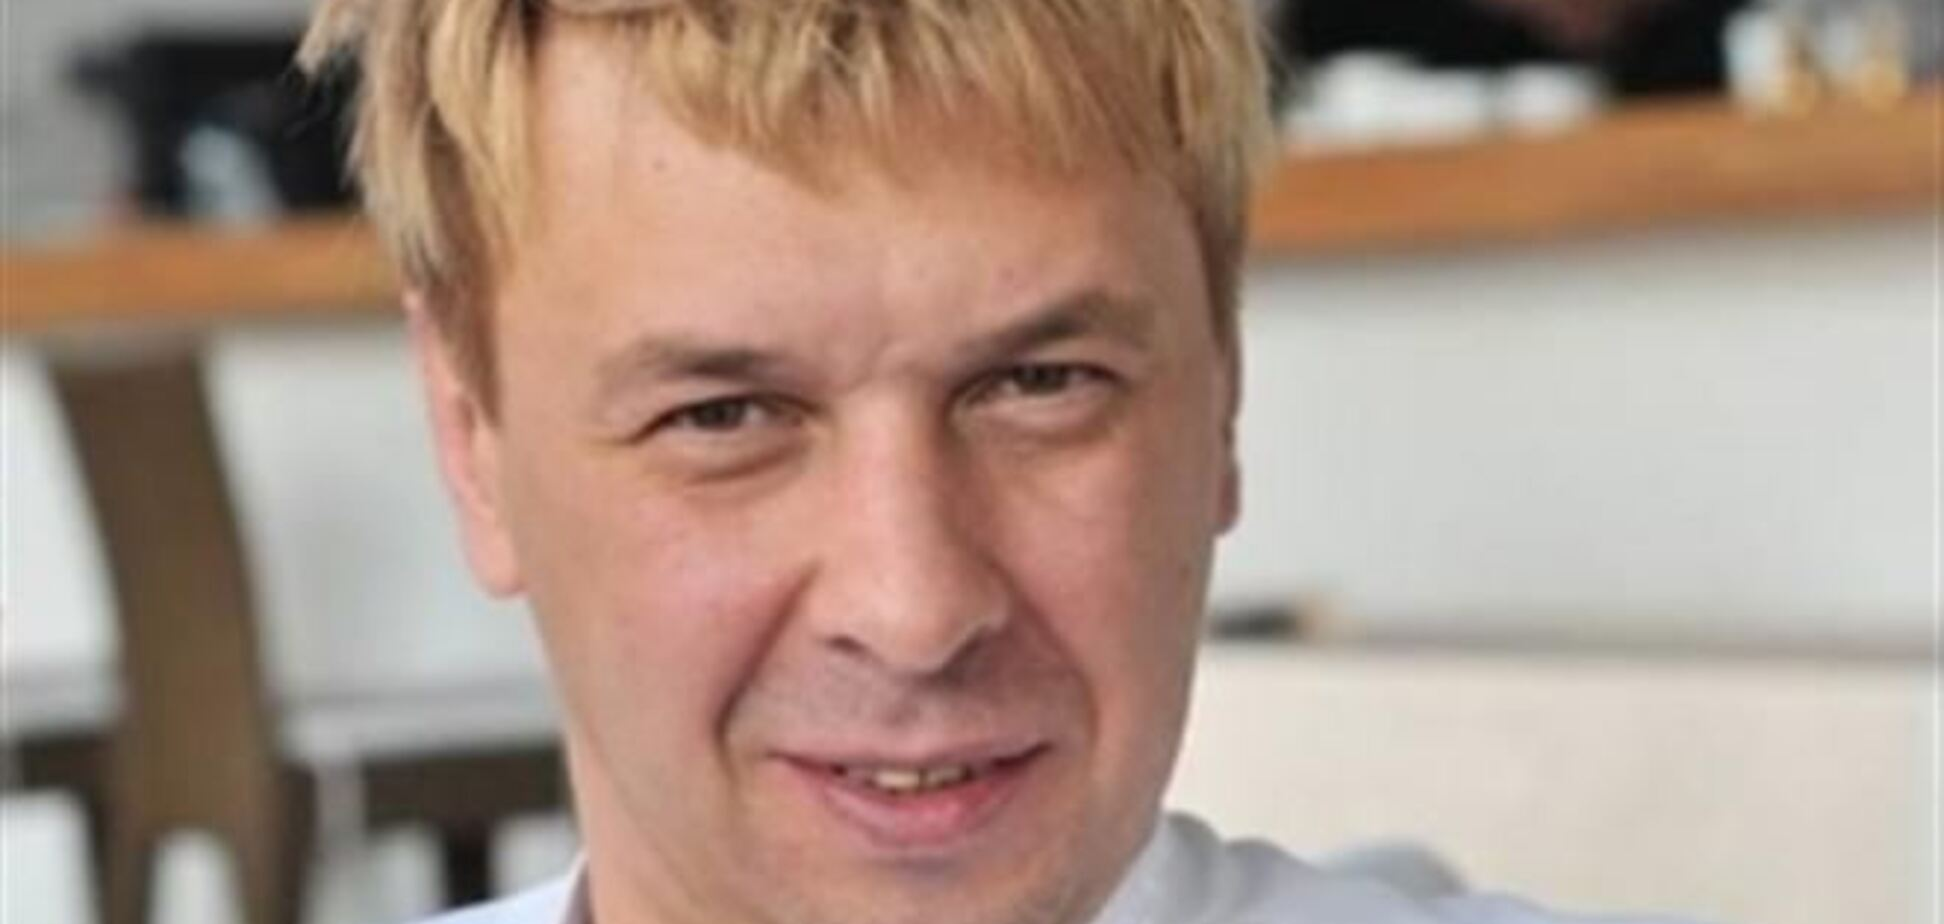 Ягольник видалив скандальний пост в Facebook про вагітність Могилевської